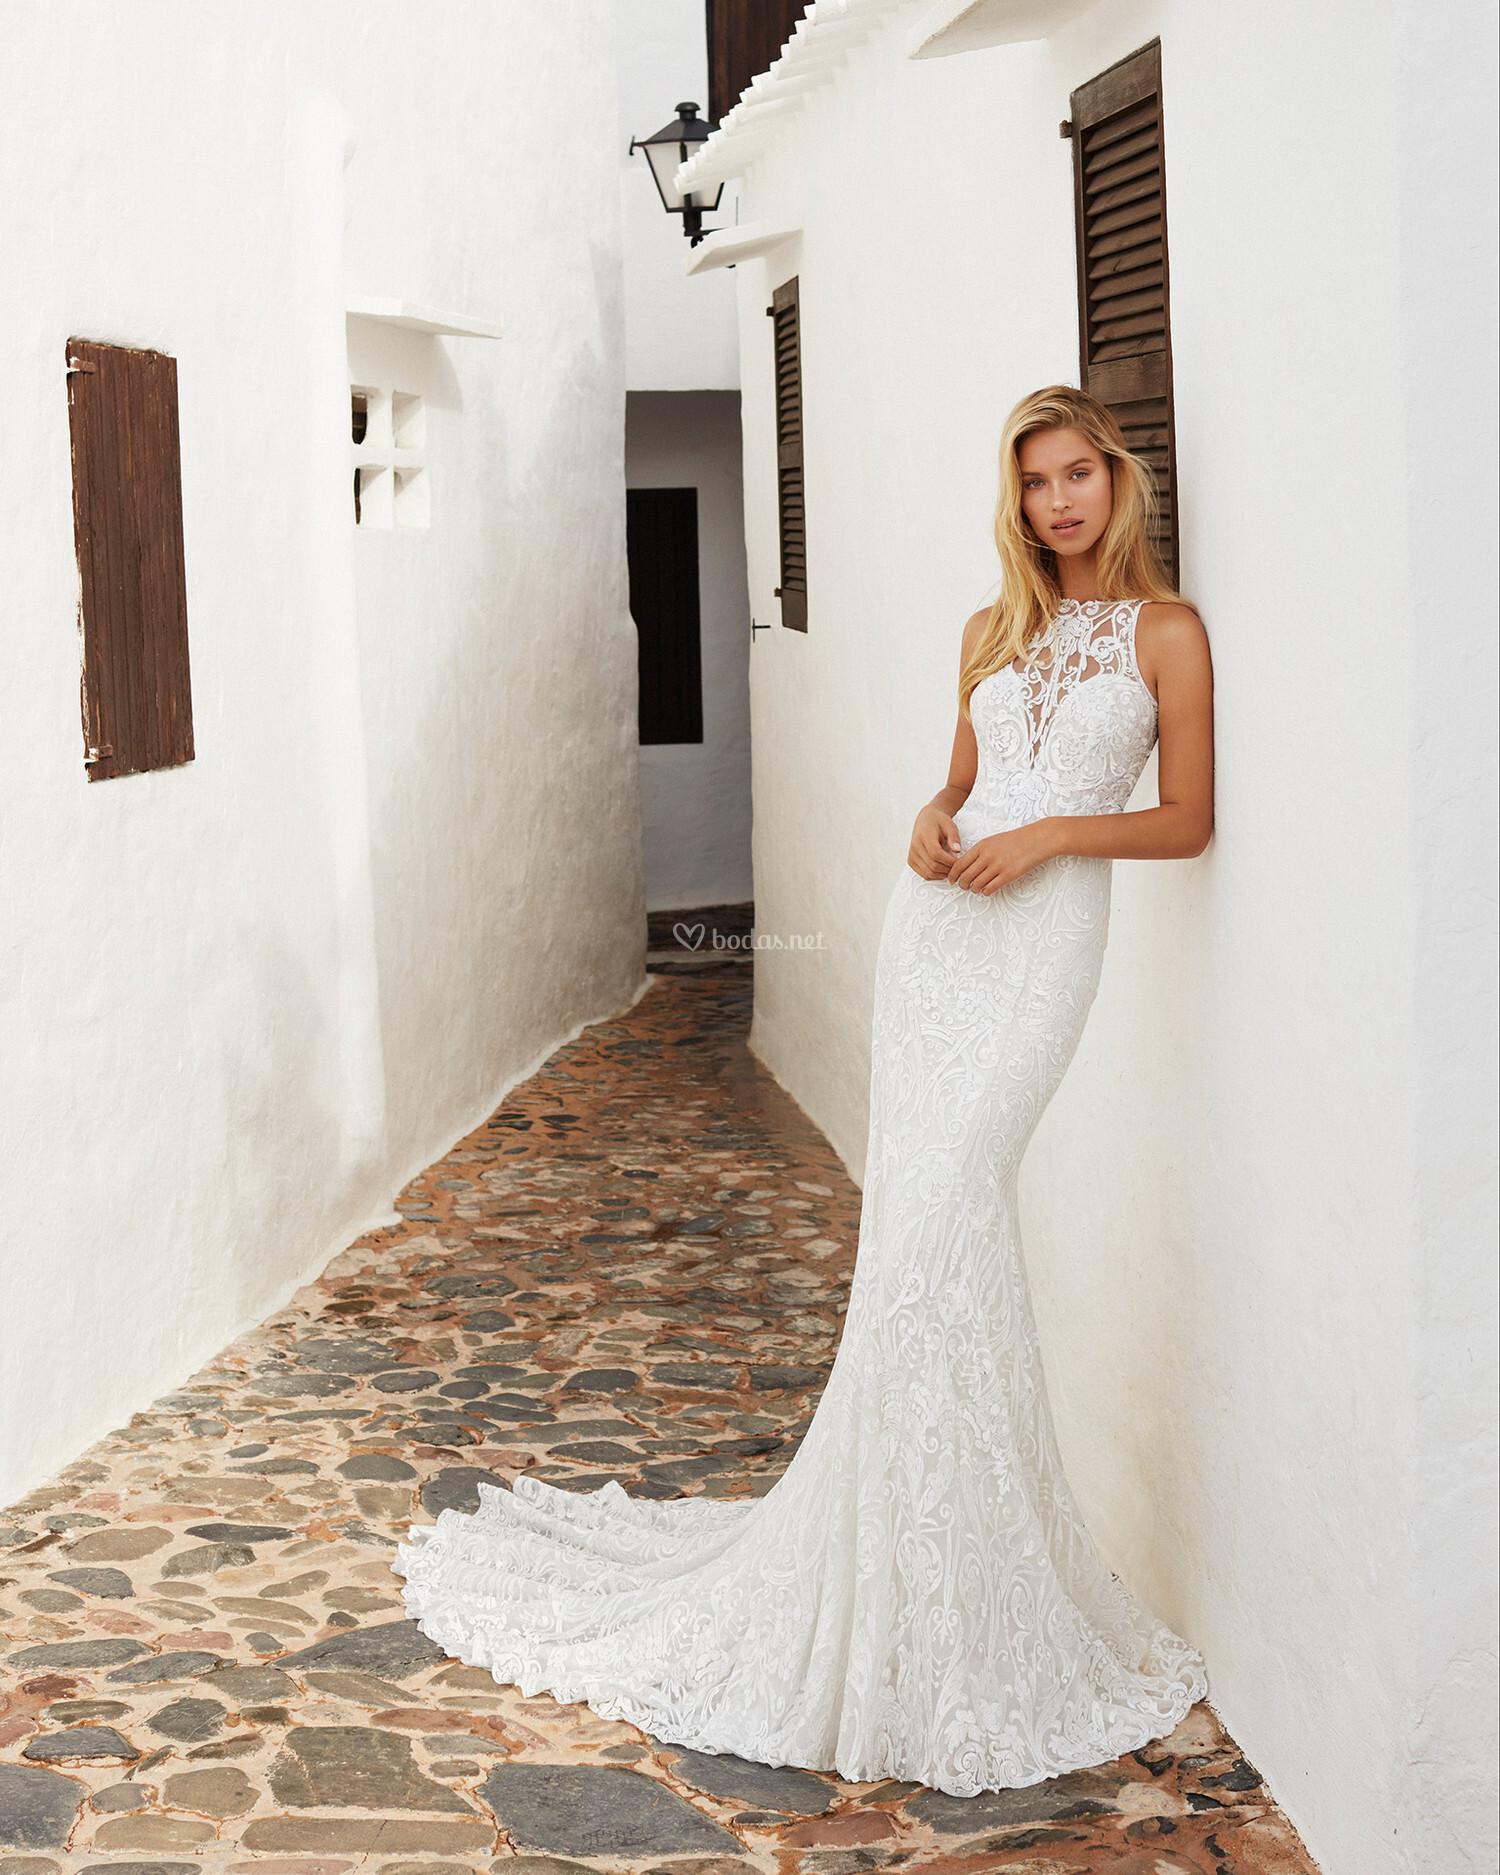 Este vestido... ¡PROHIBIDO en mi boda! 3